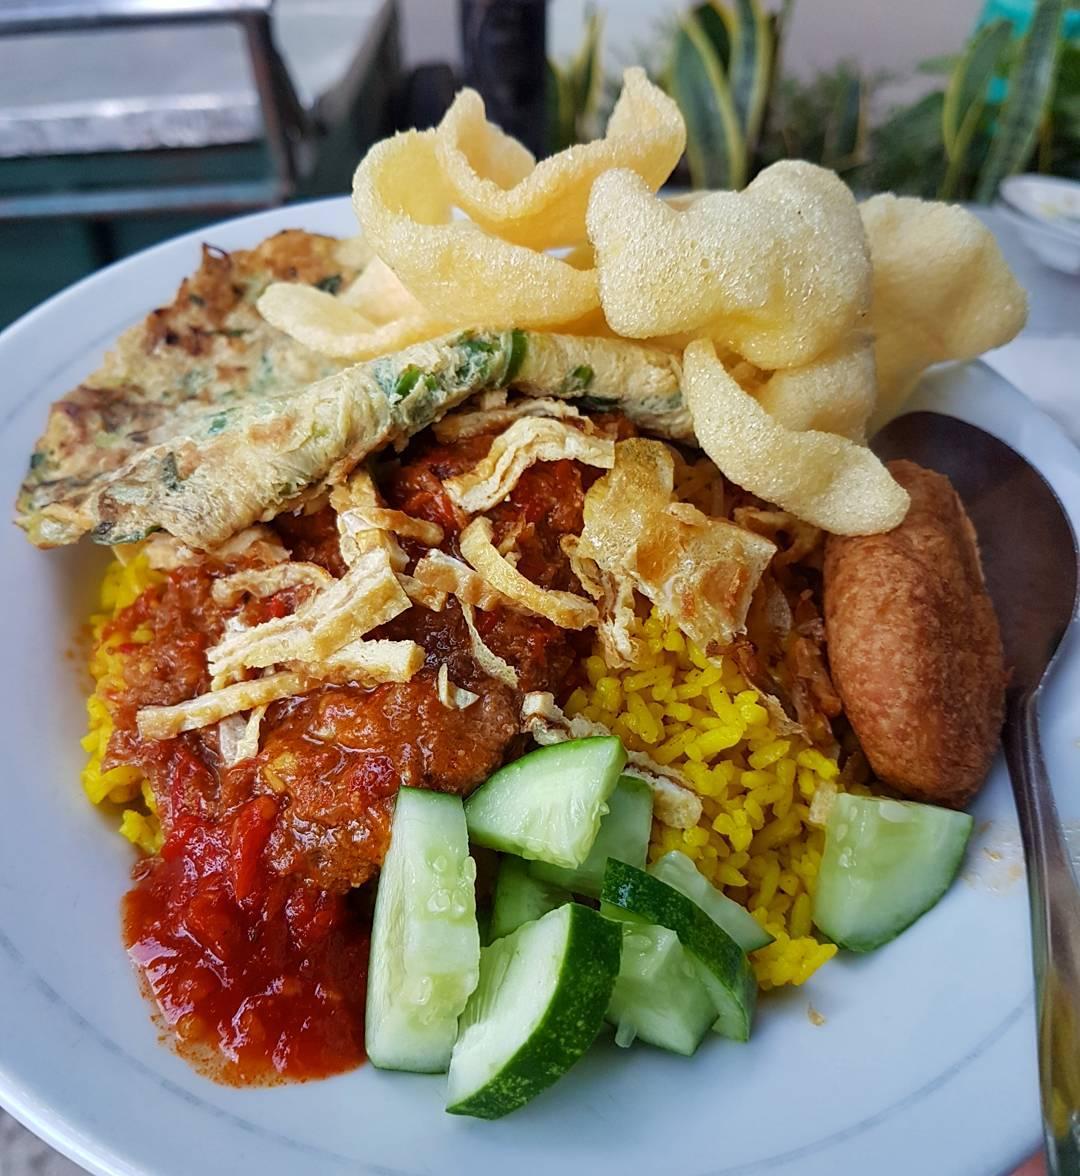 Nasi Kuning Sumur Bandung, Bandung, Kota Bandung, Dolan Dolen, Dolaners Nasi Kuning Sumur Bandung via lapercuy - Dolan Dolen